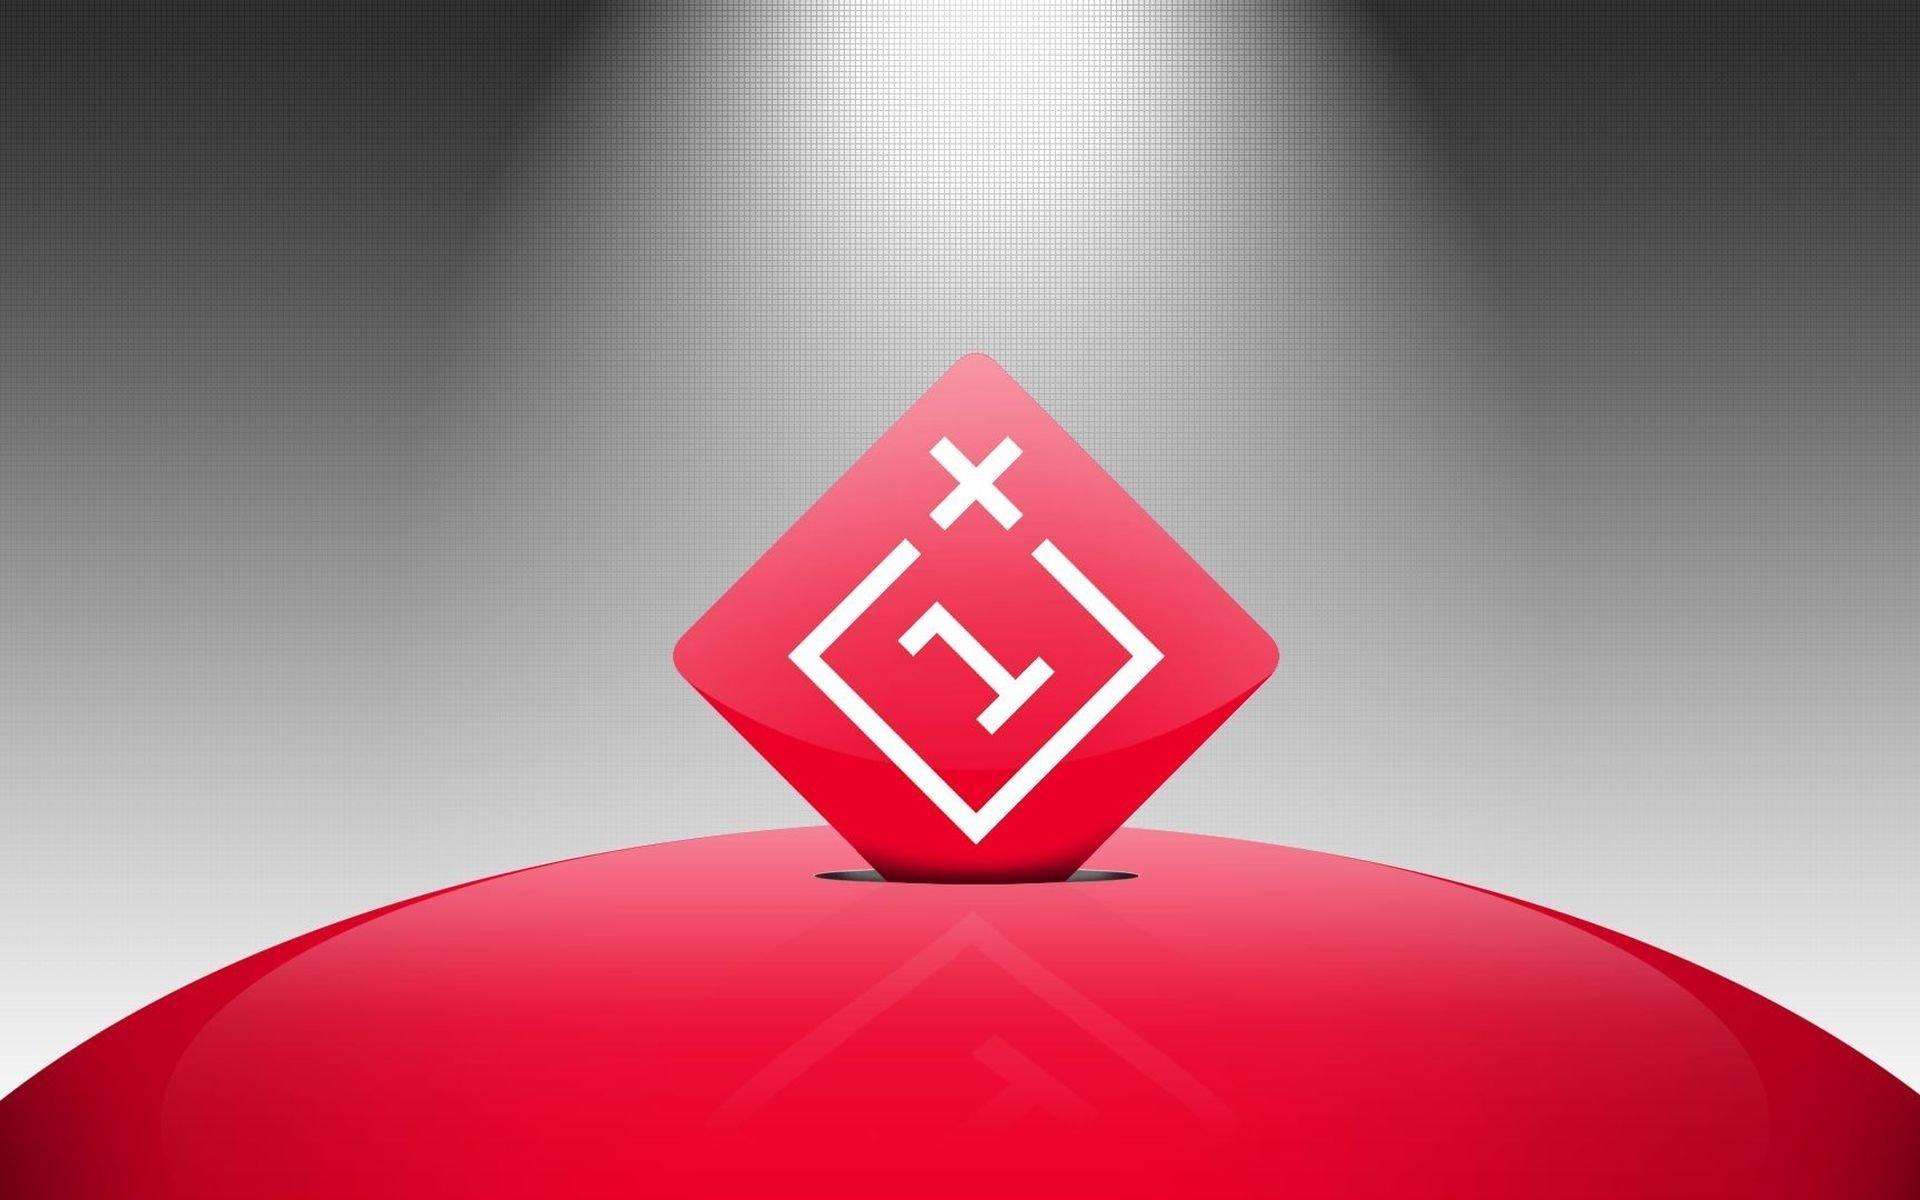 logo da OnePlus